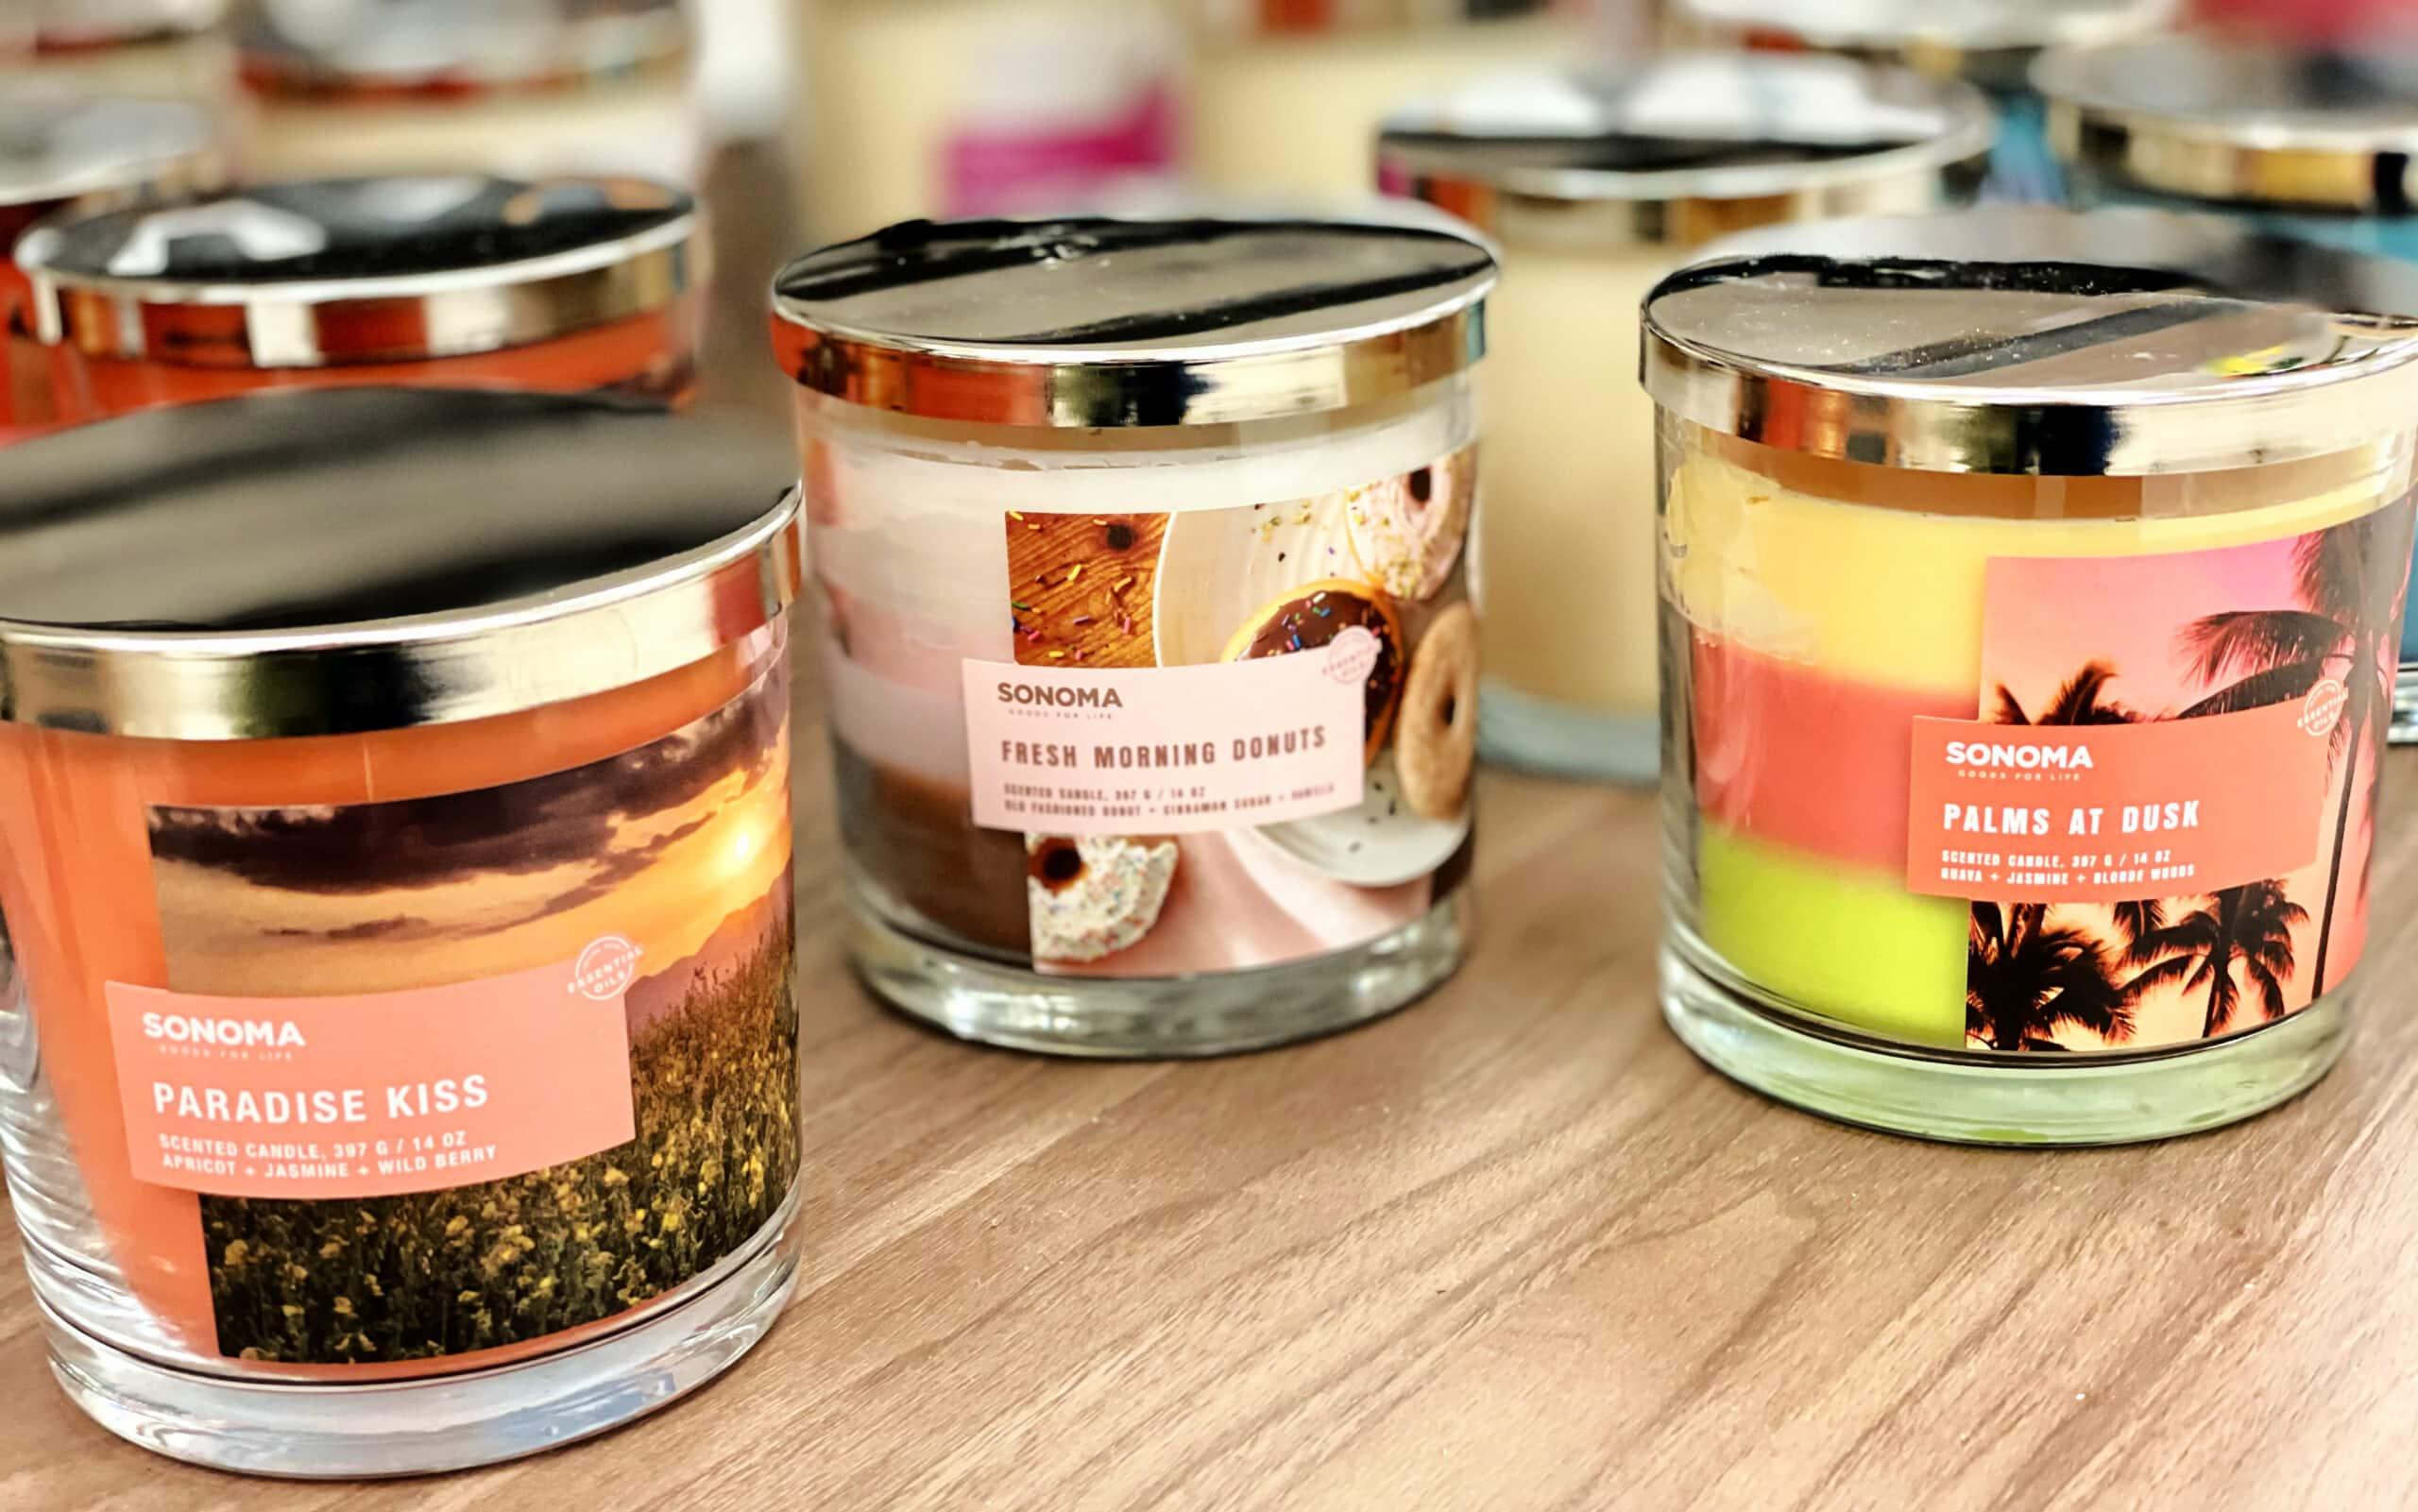 sonoma candles